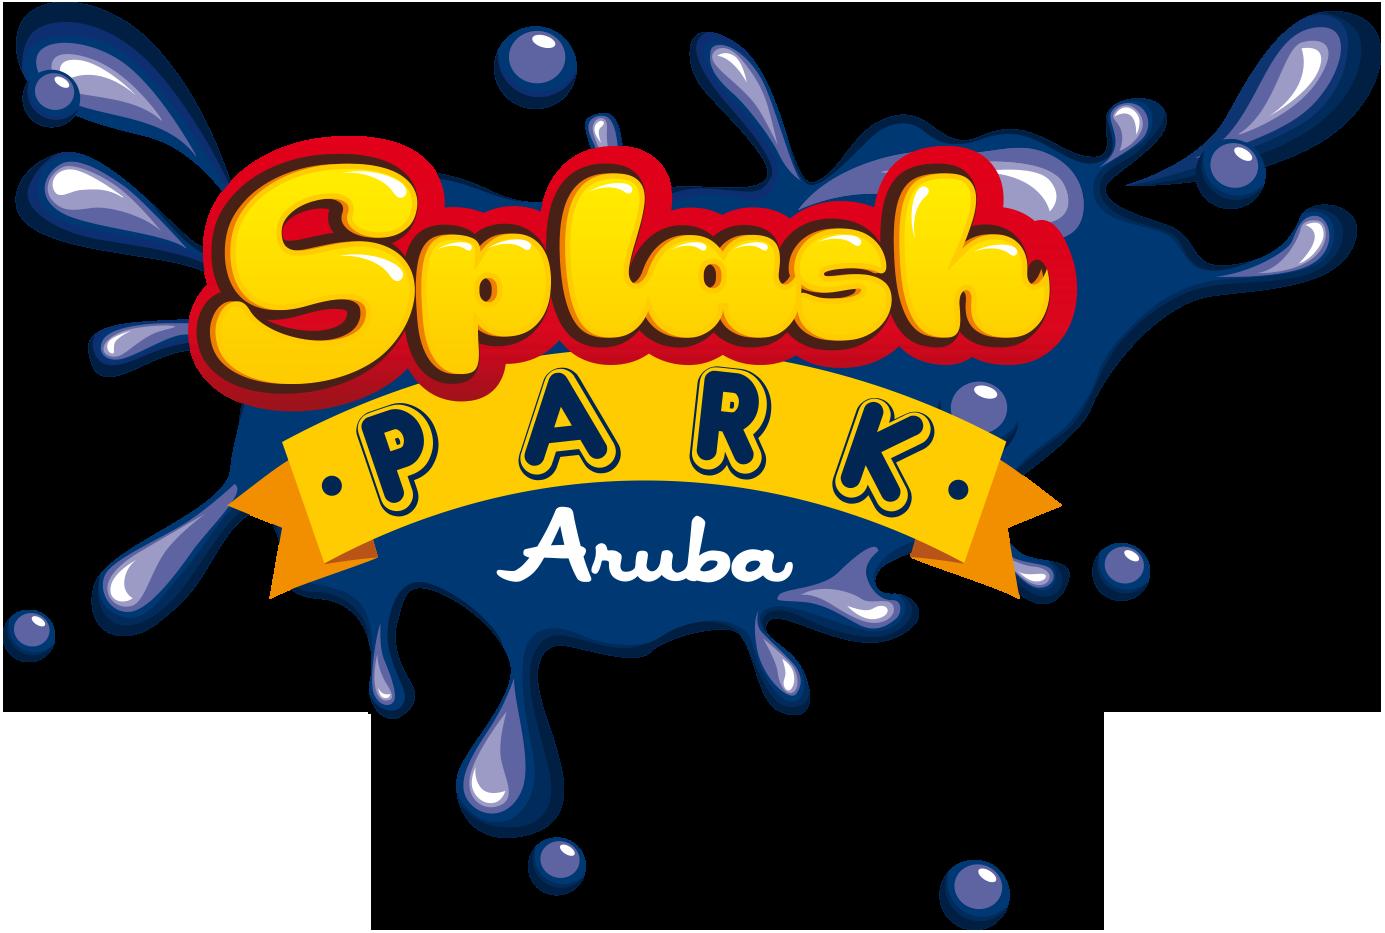 Sun over ocean clipart graphic library Splash Park Aruba – Ocean Fun in the Sun! graphic library